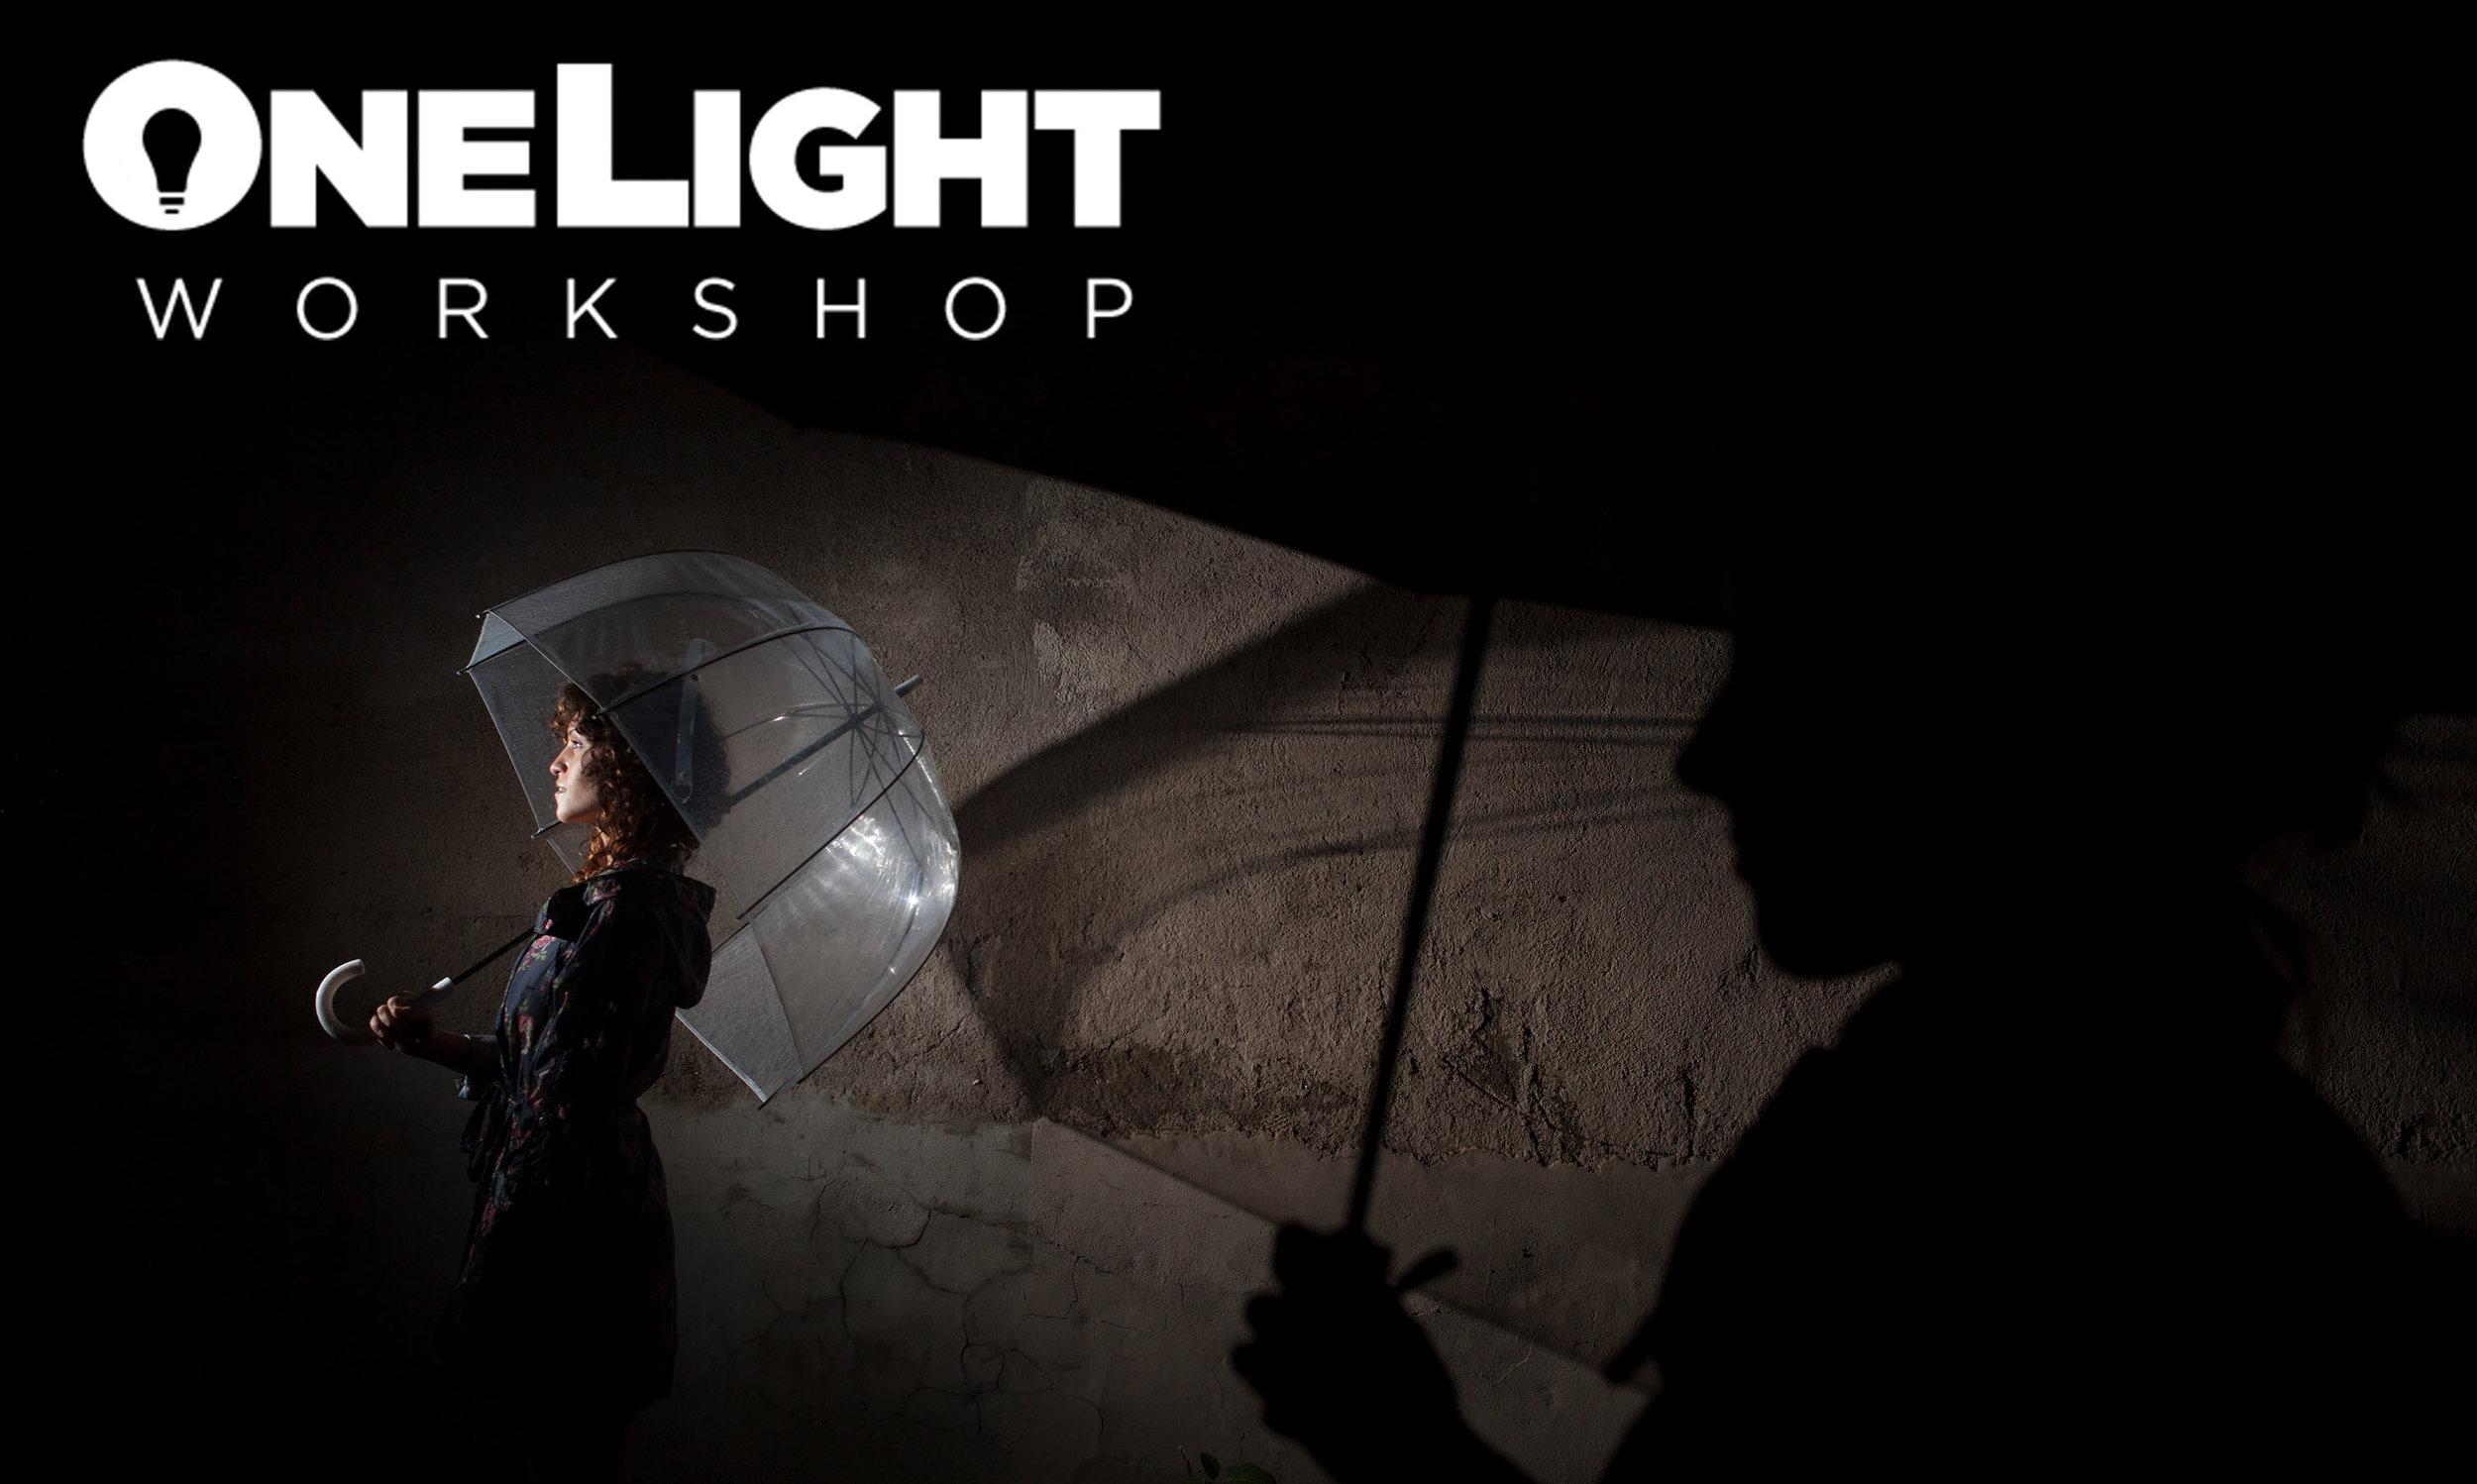 The OneLight Workshop